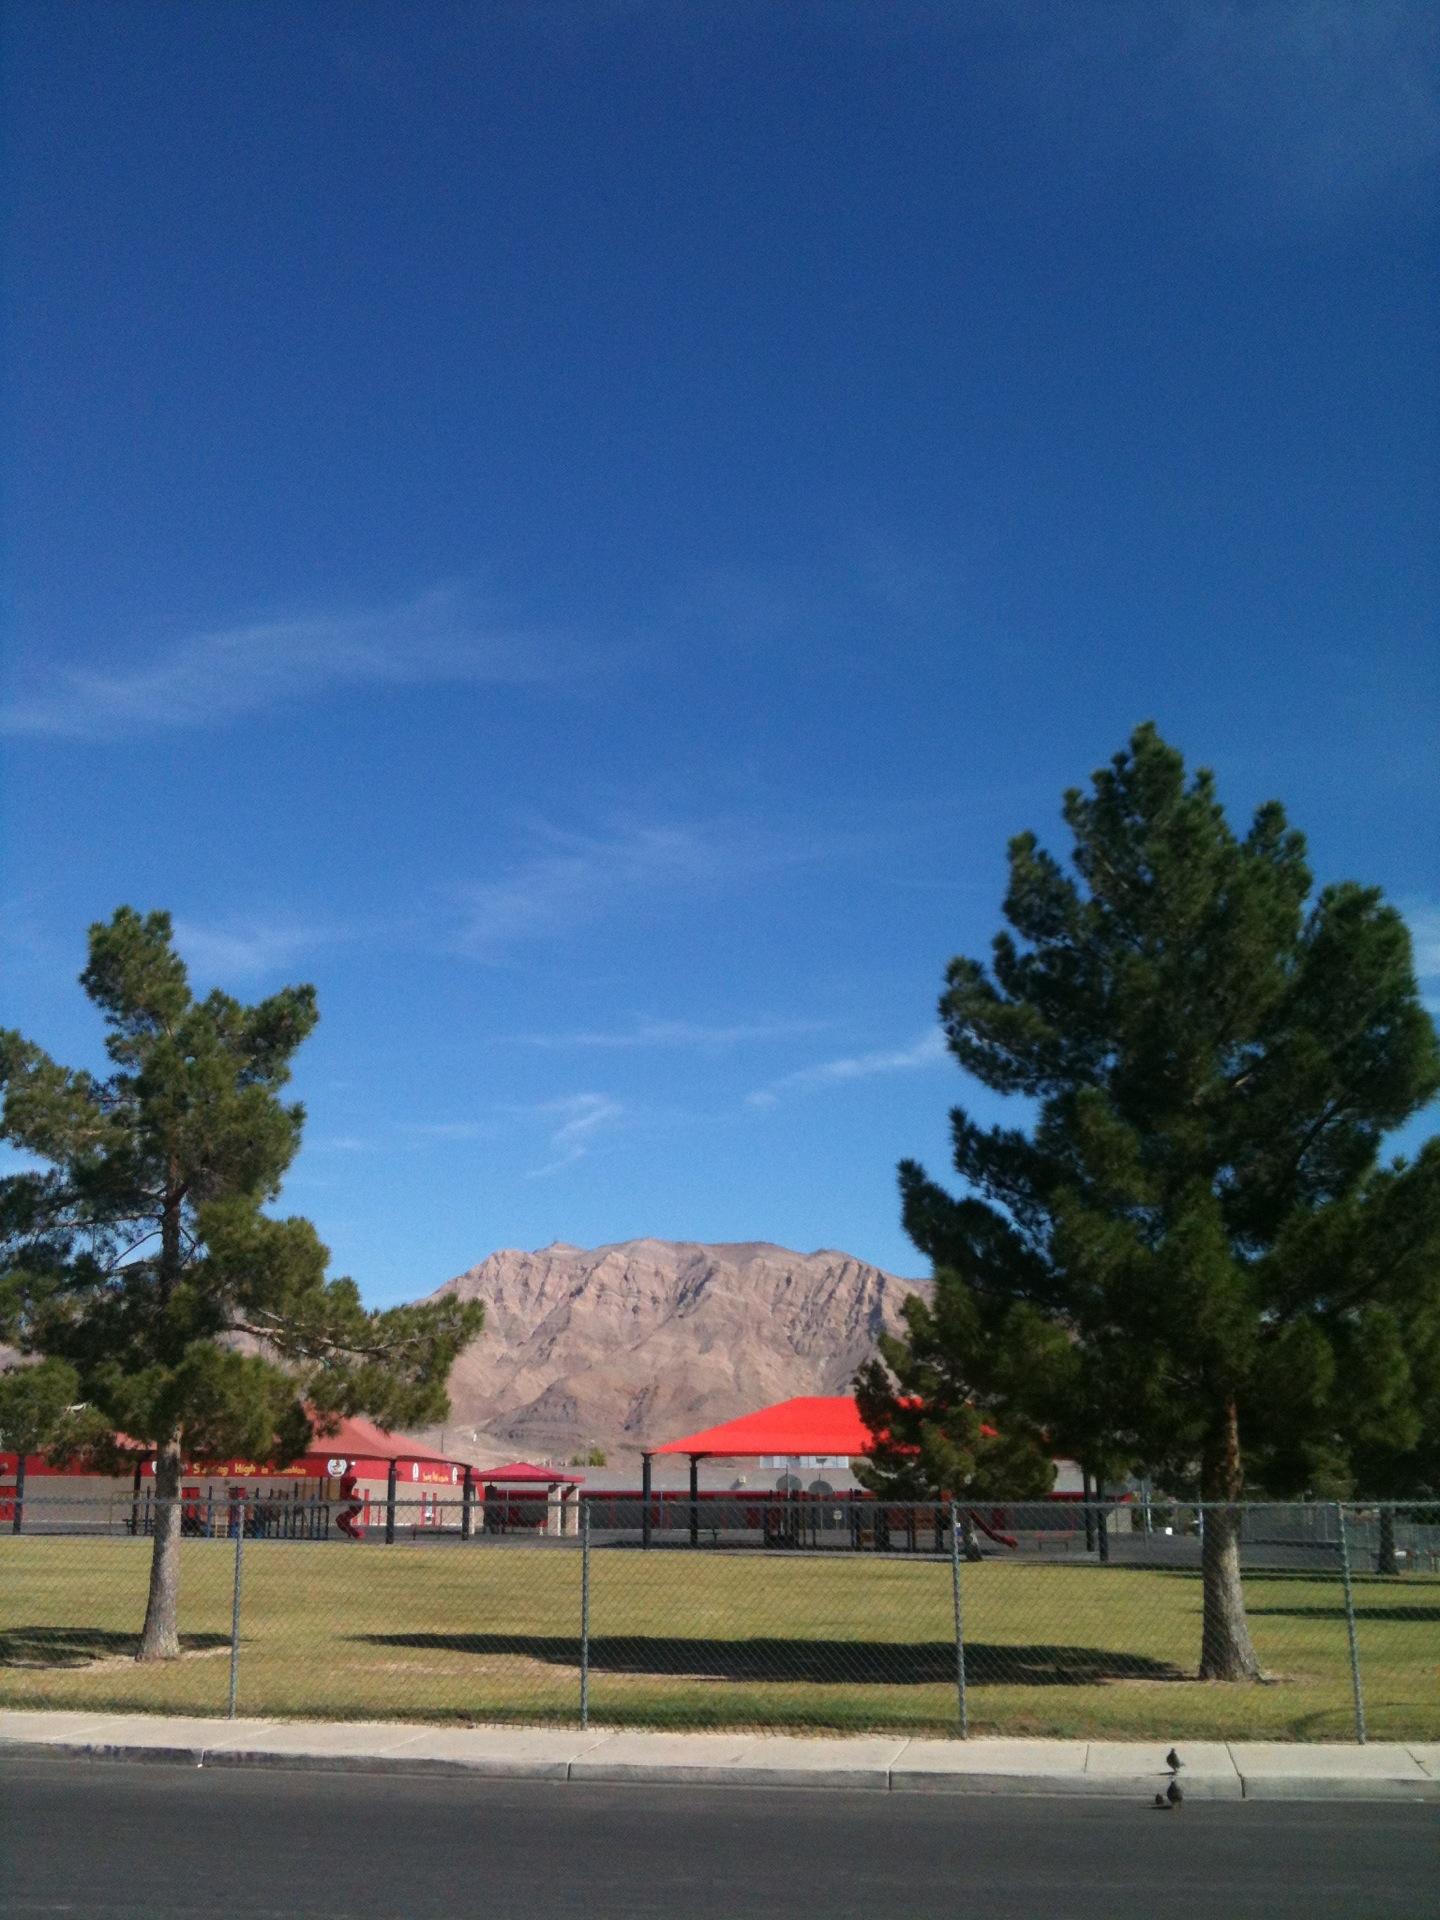 Richard J Rundle Elementary School | 425 N Christy Ln, Las Vegas, NV, 89110 | +1 (702) 799-7380